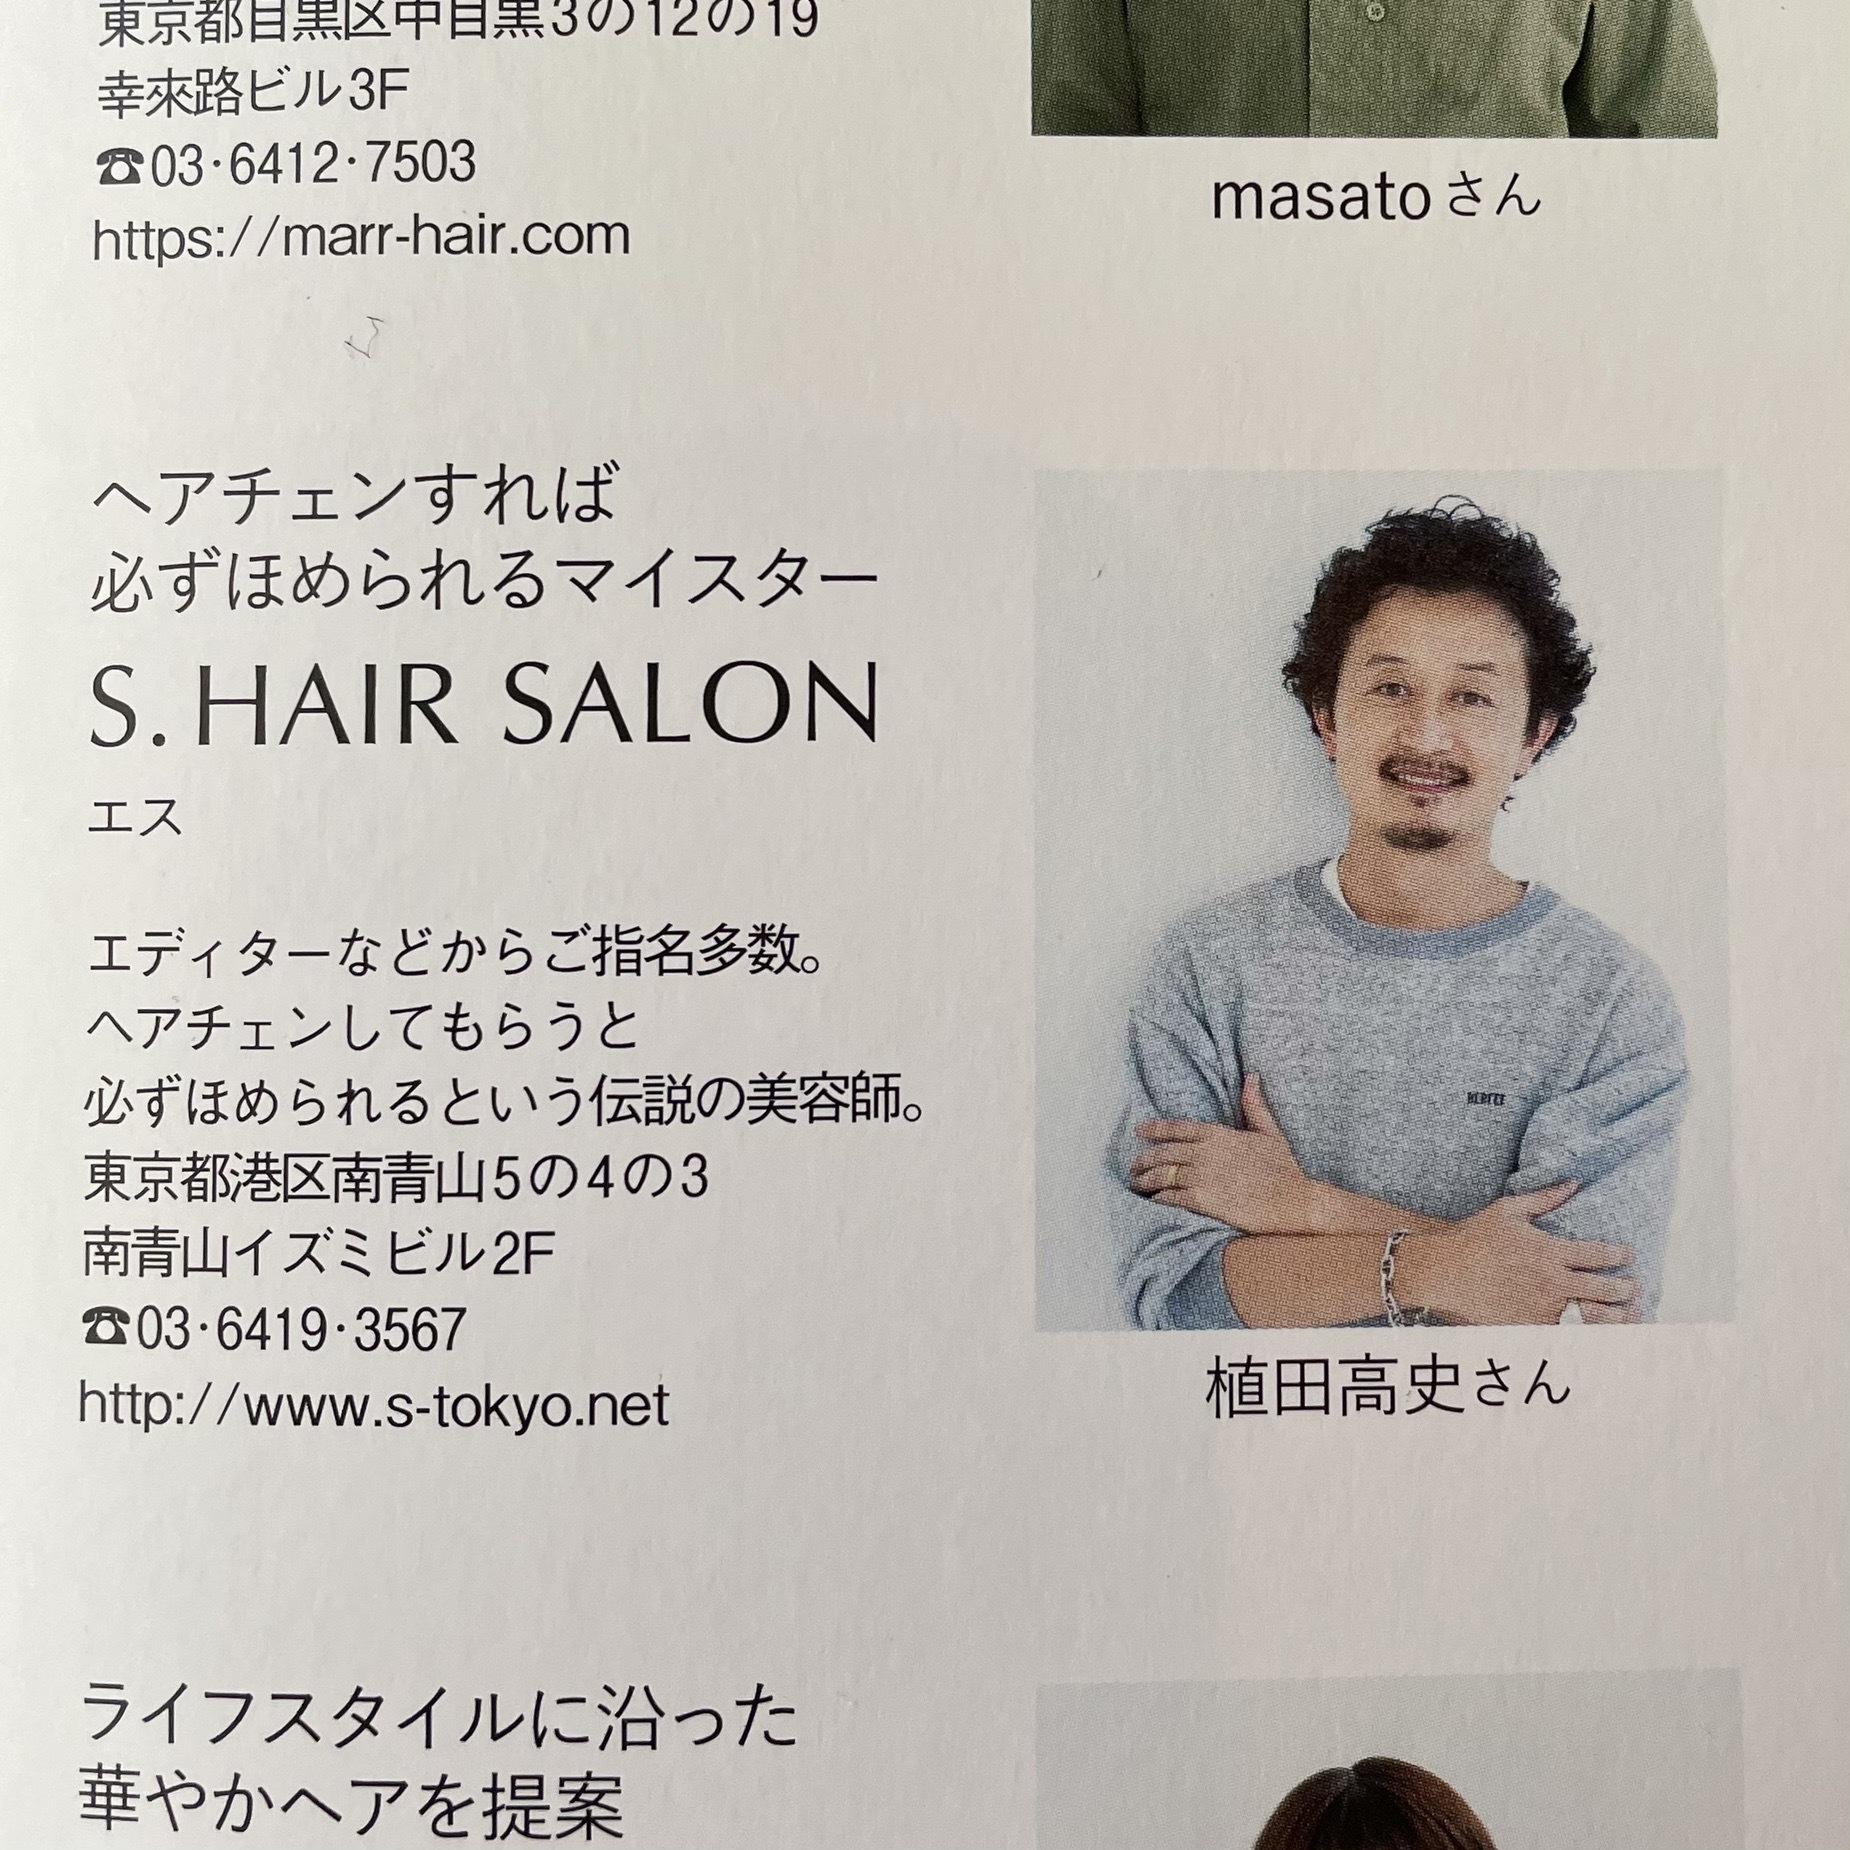 S.HAIR SALONの植田さんの紹介文と顔写真